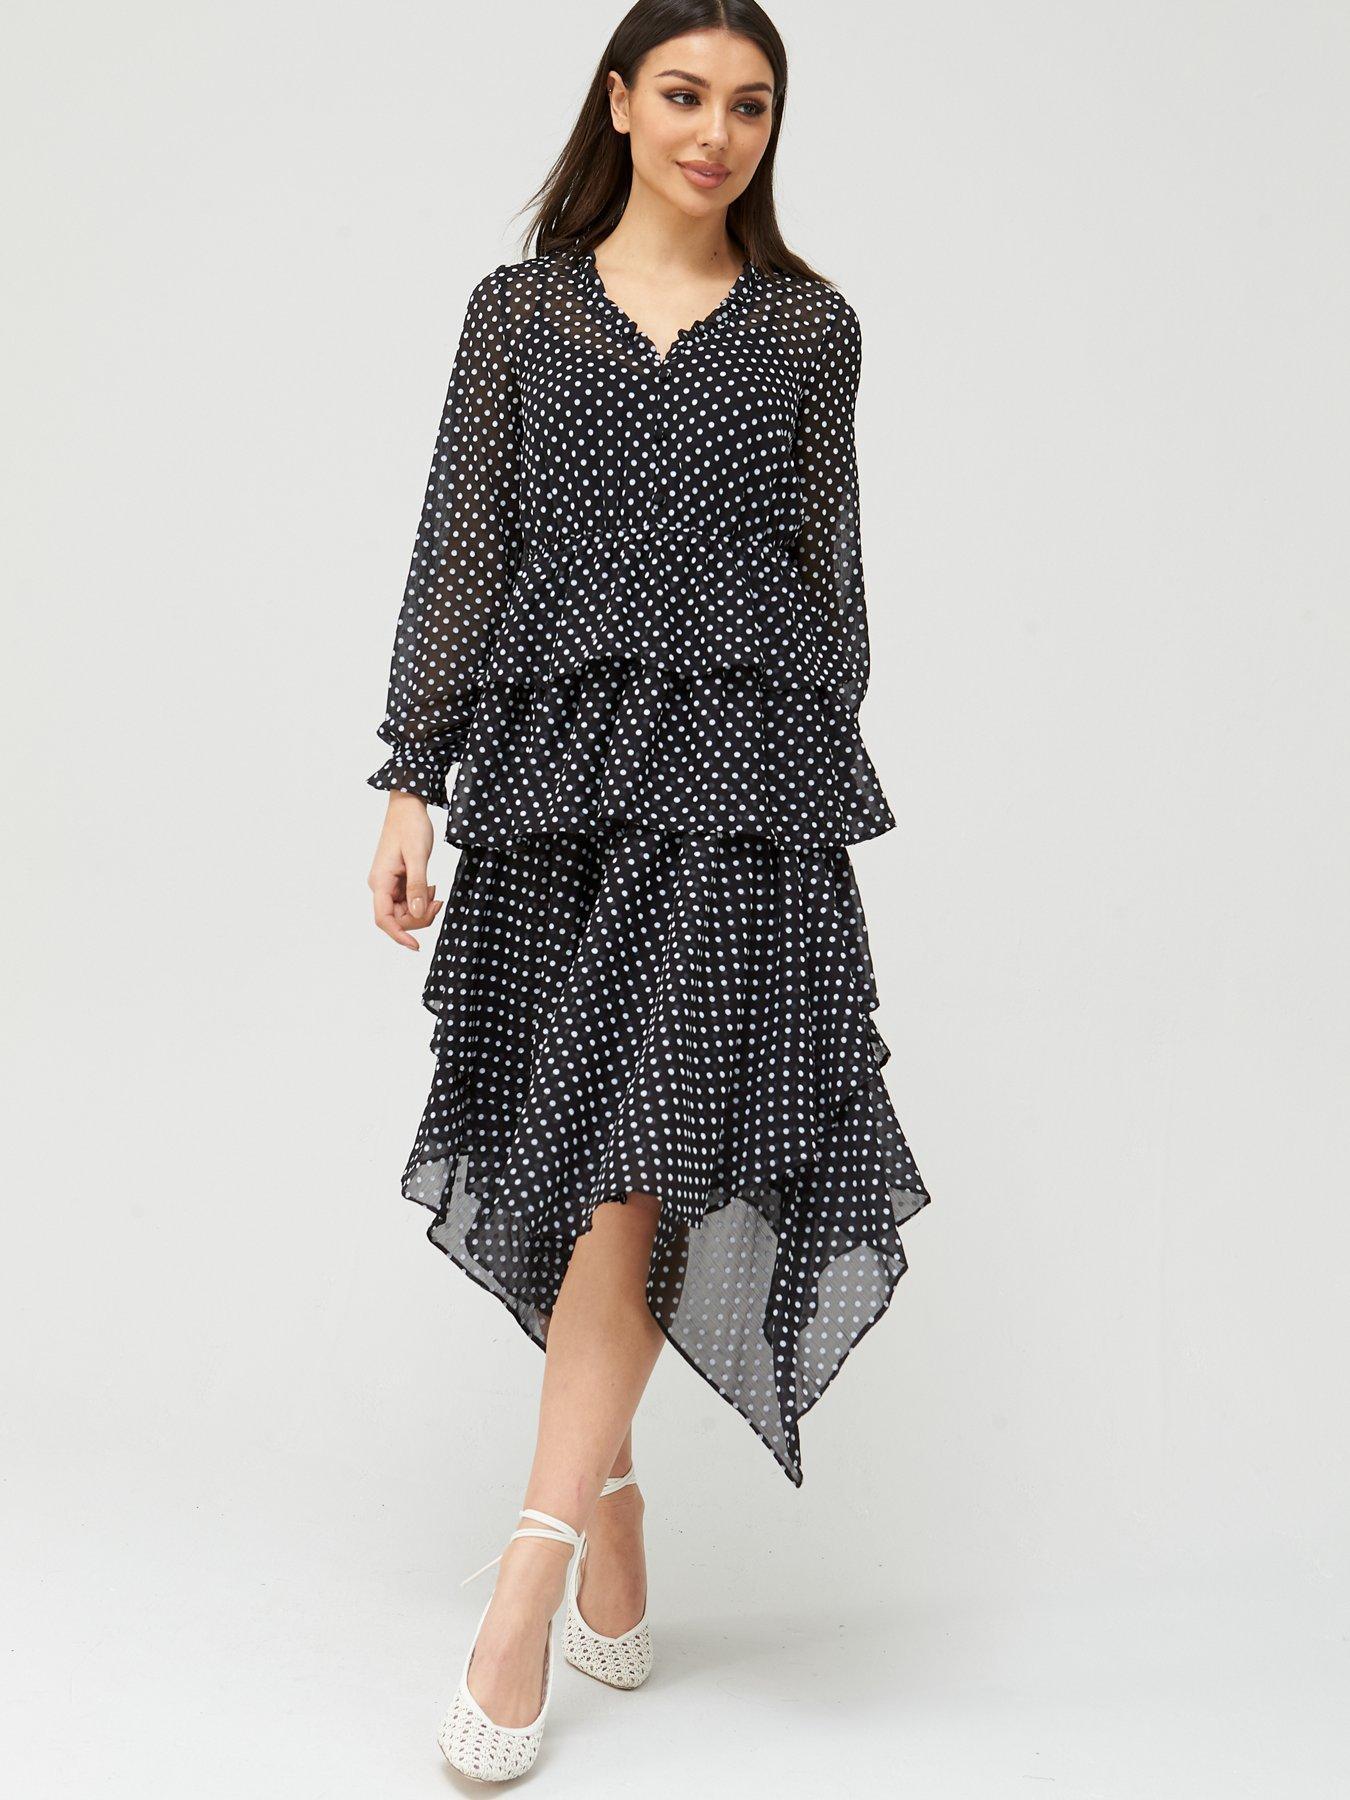 DESIGNER MATERNITY SMART KHAKI PINIFORE DRESS SUMMER SIZE 8 10 12 14 NEW